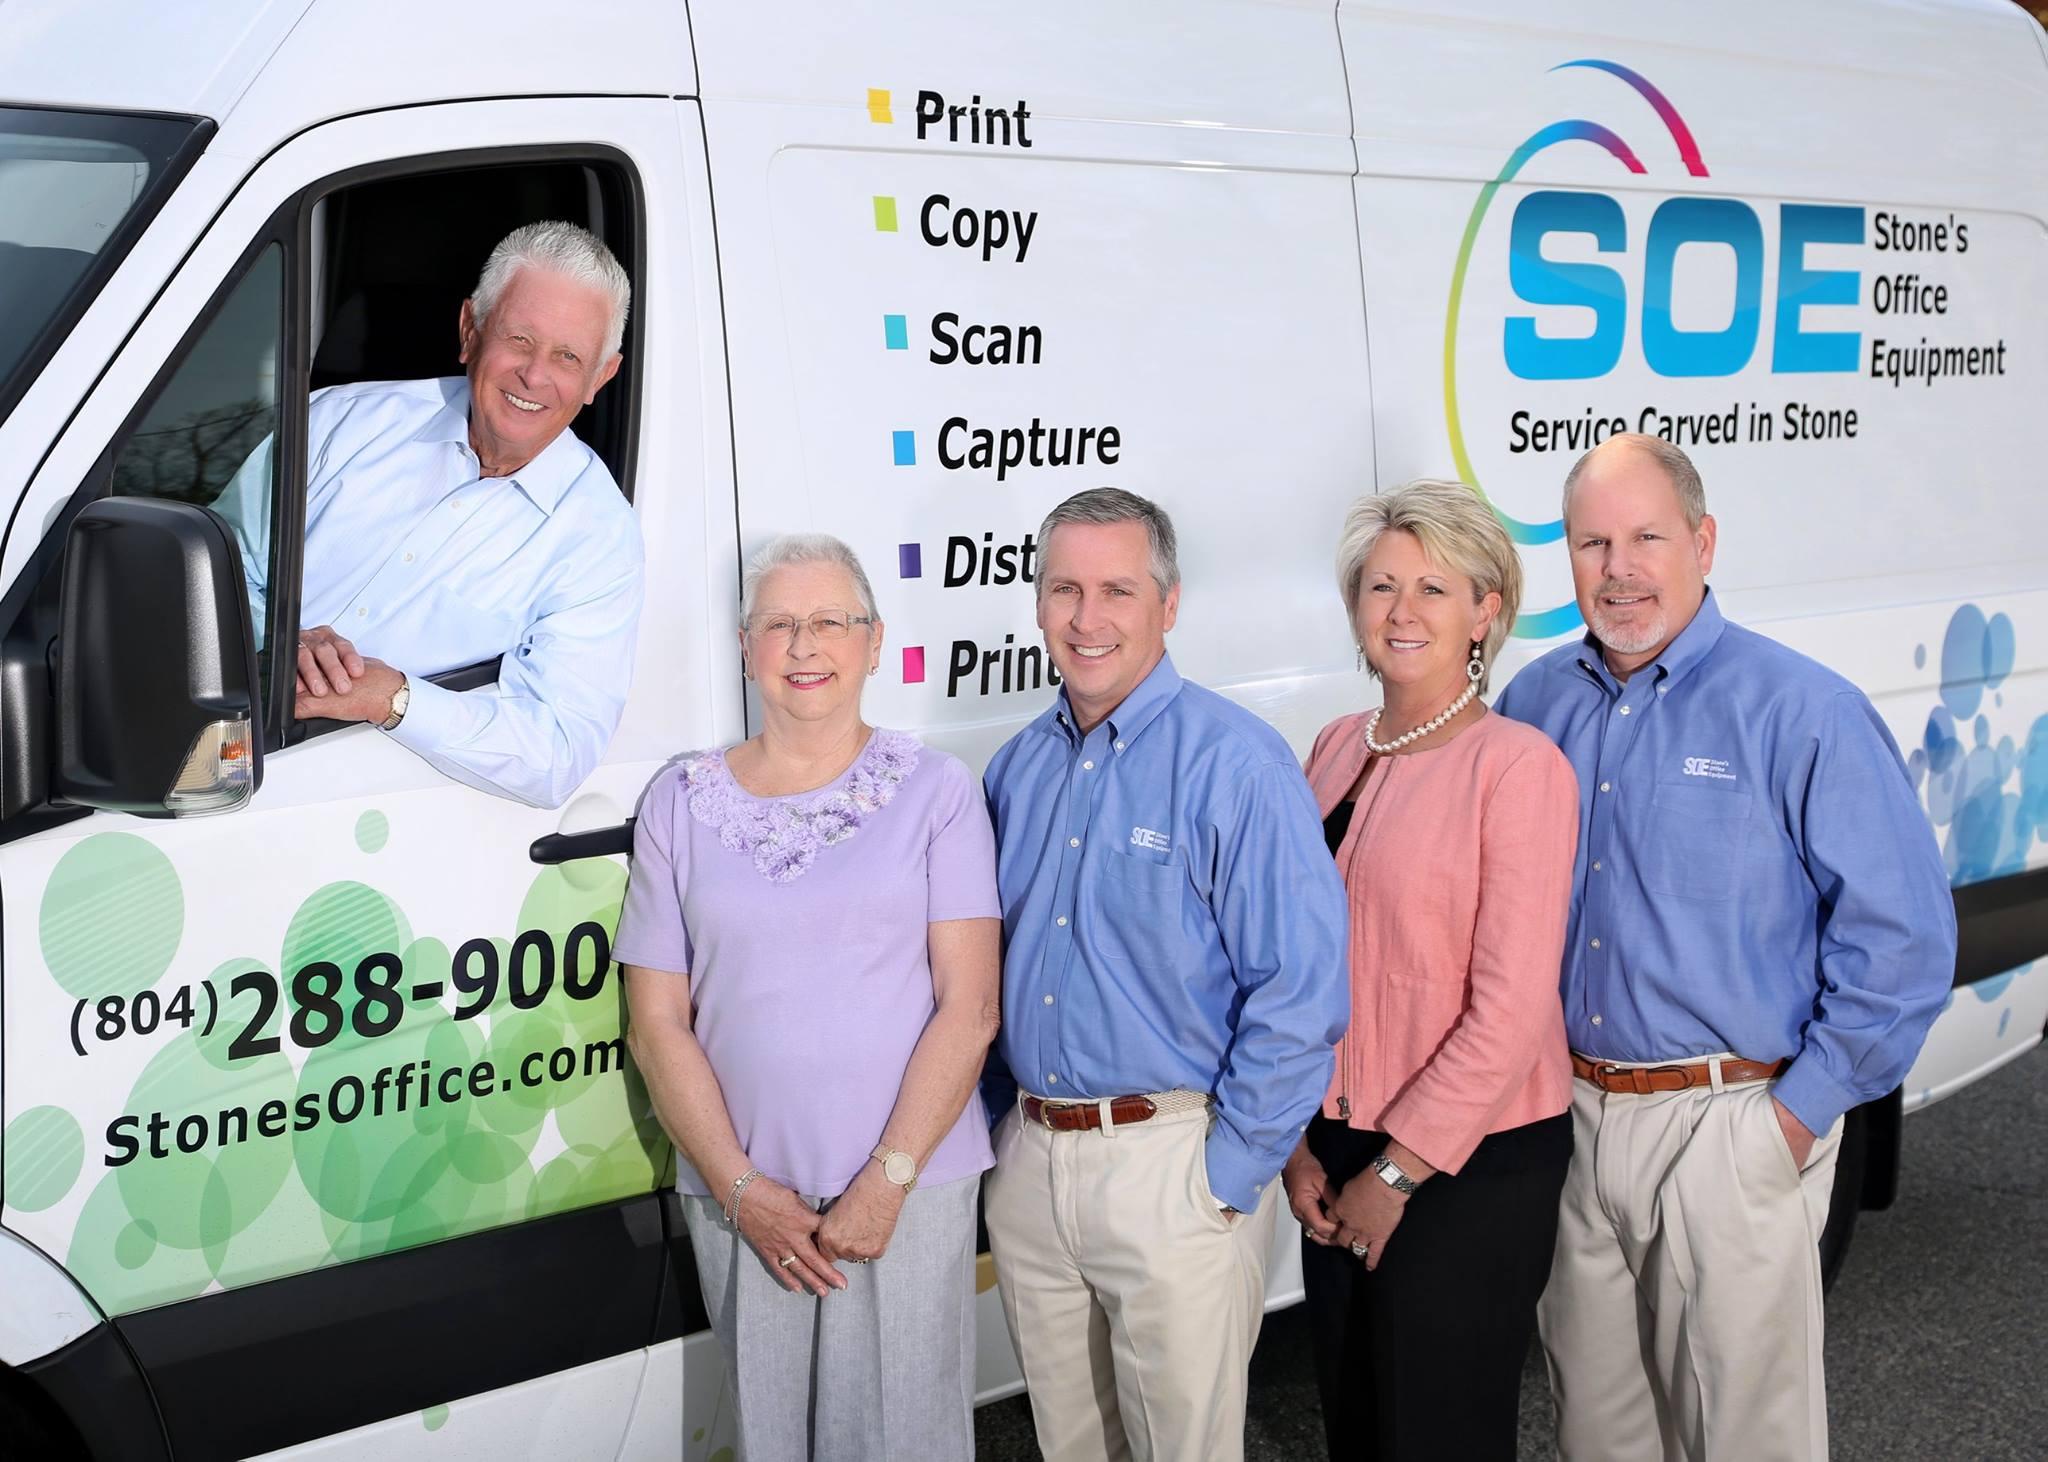 SOE (Stones Office Equipment) of Virginia - Frank Stone, Sally, Mike, Tina and Sam